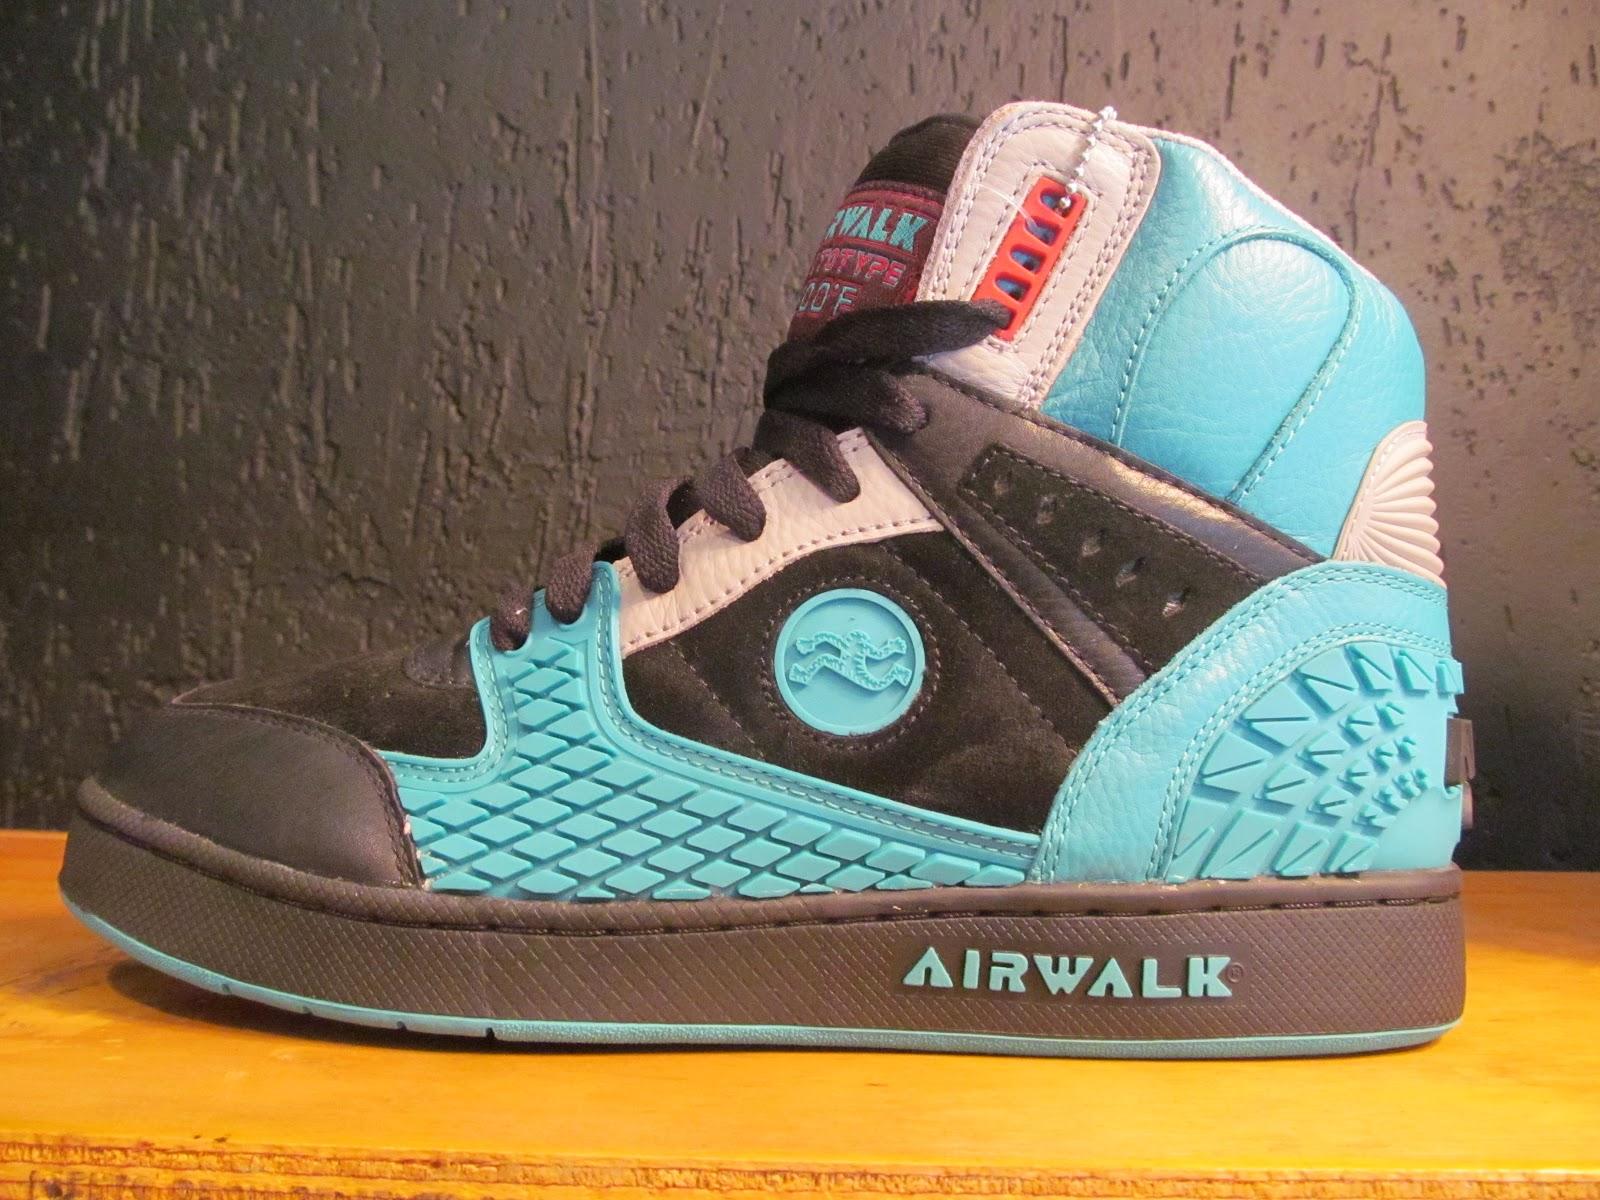 wholesale dealer 42c11 65351 ... AIRWALK PROTOTYPE 540 600 ...